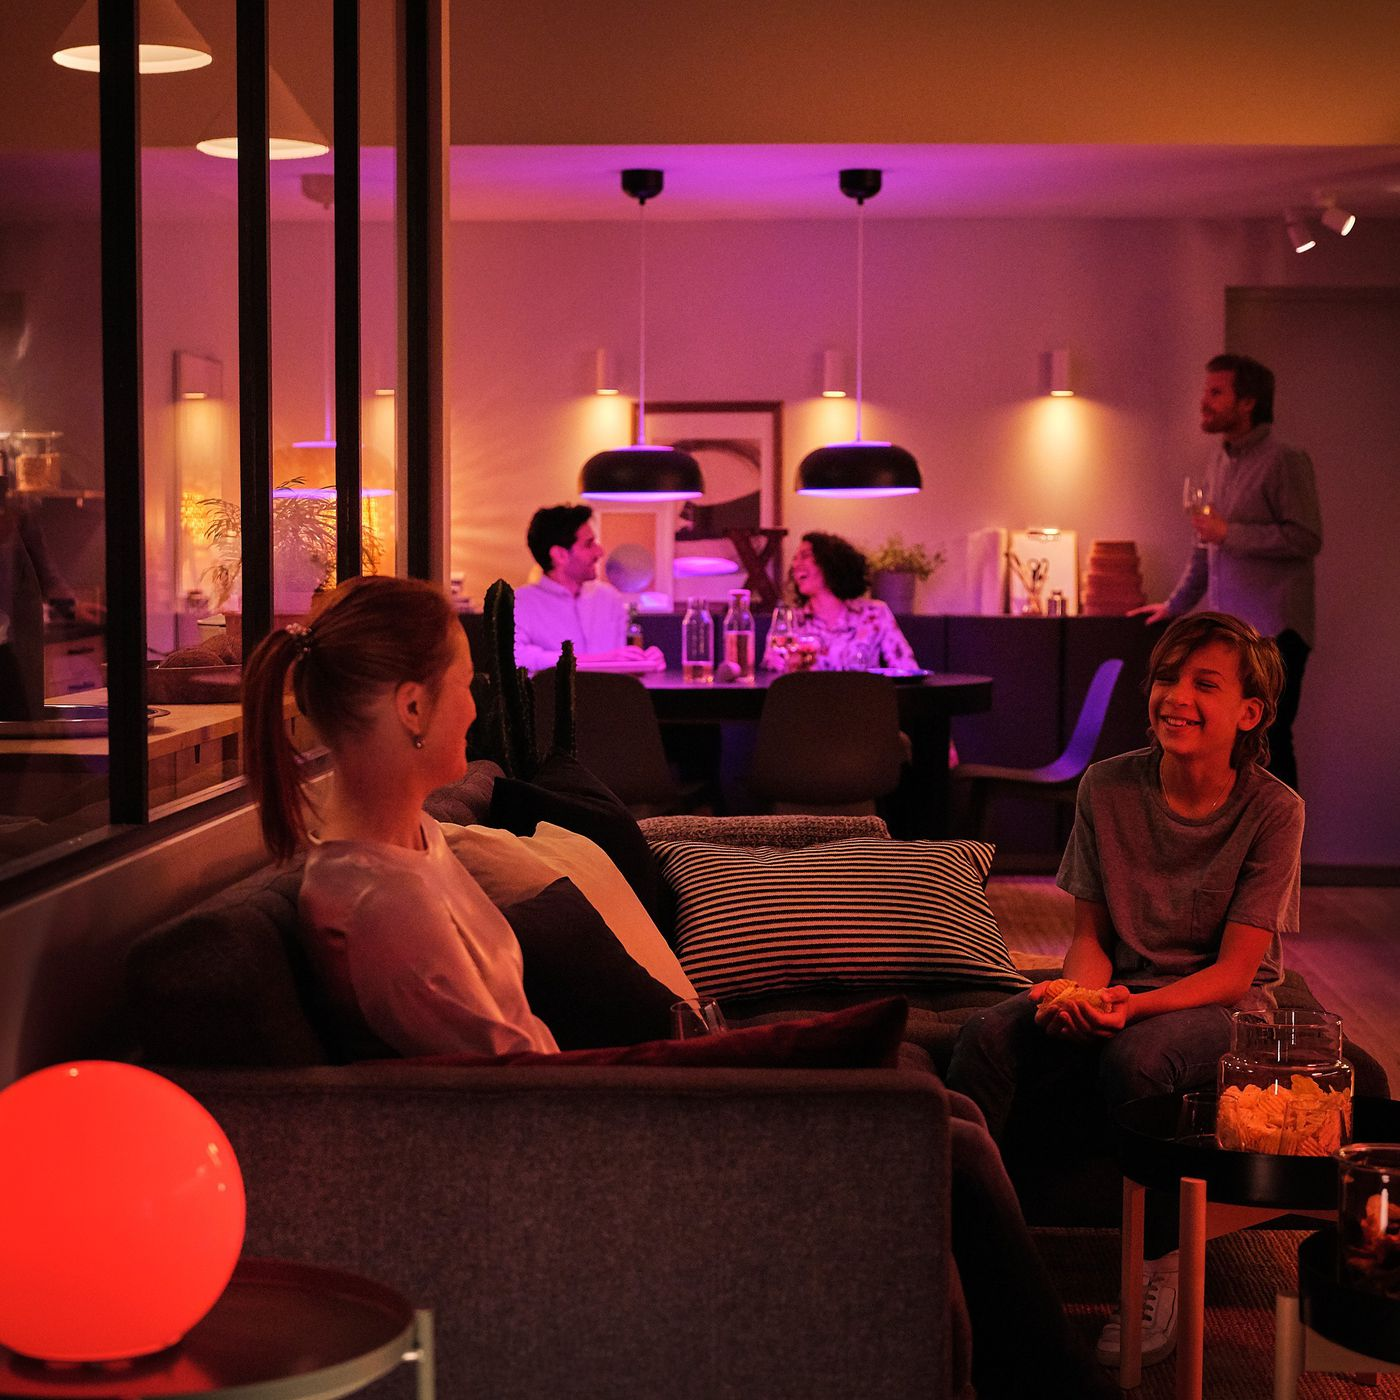 Ikea S Economical Range Of Smart Lights